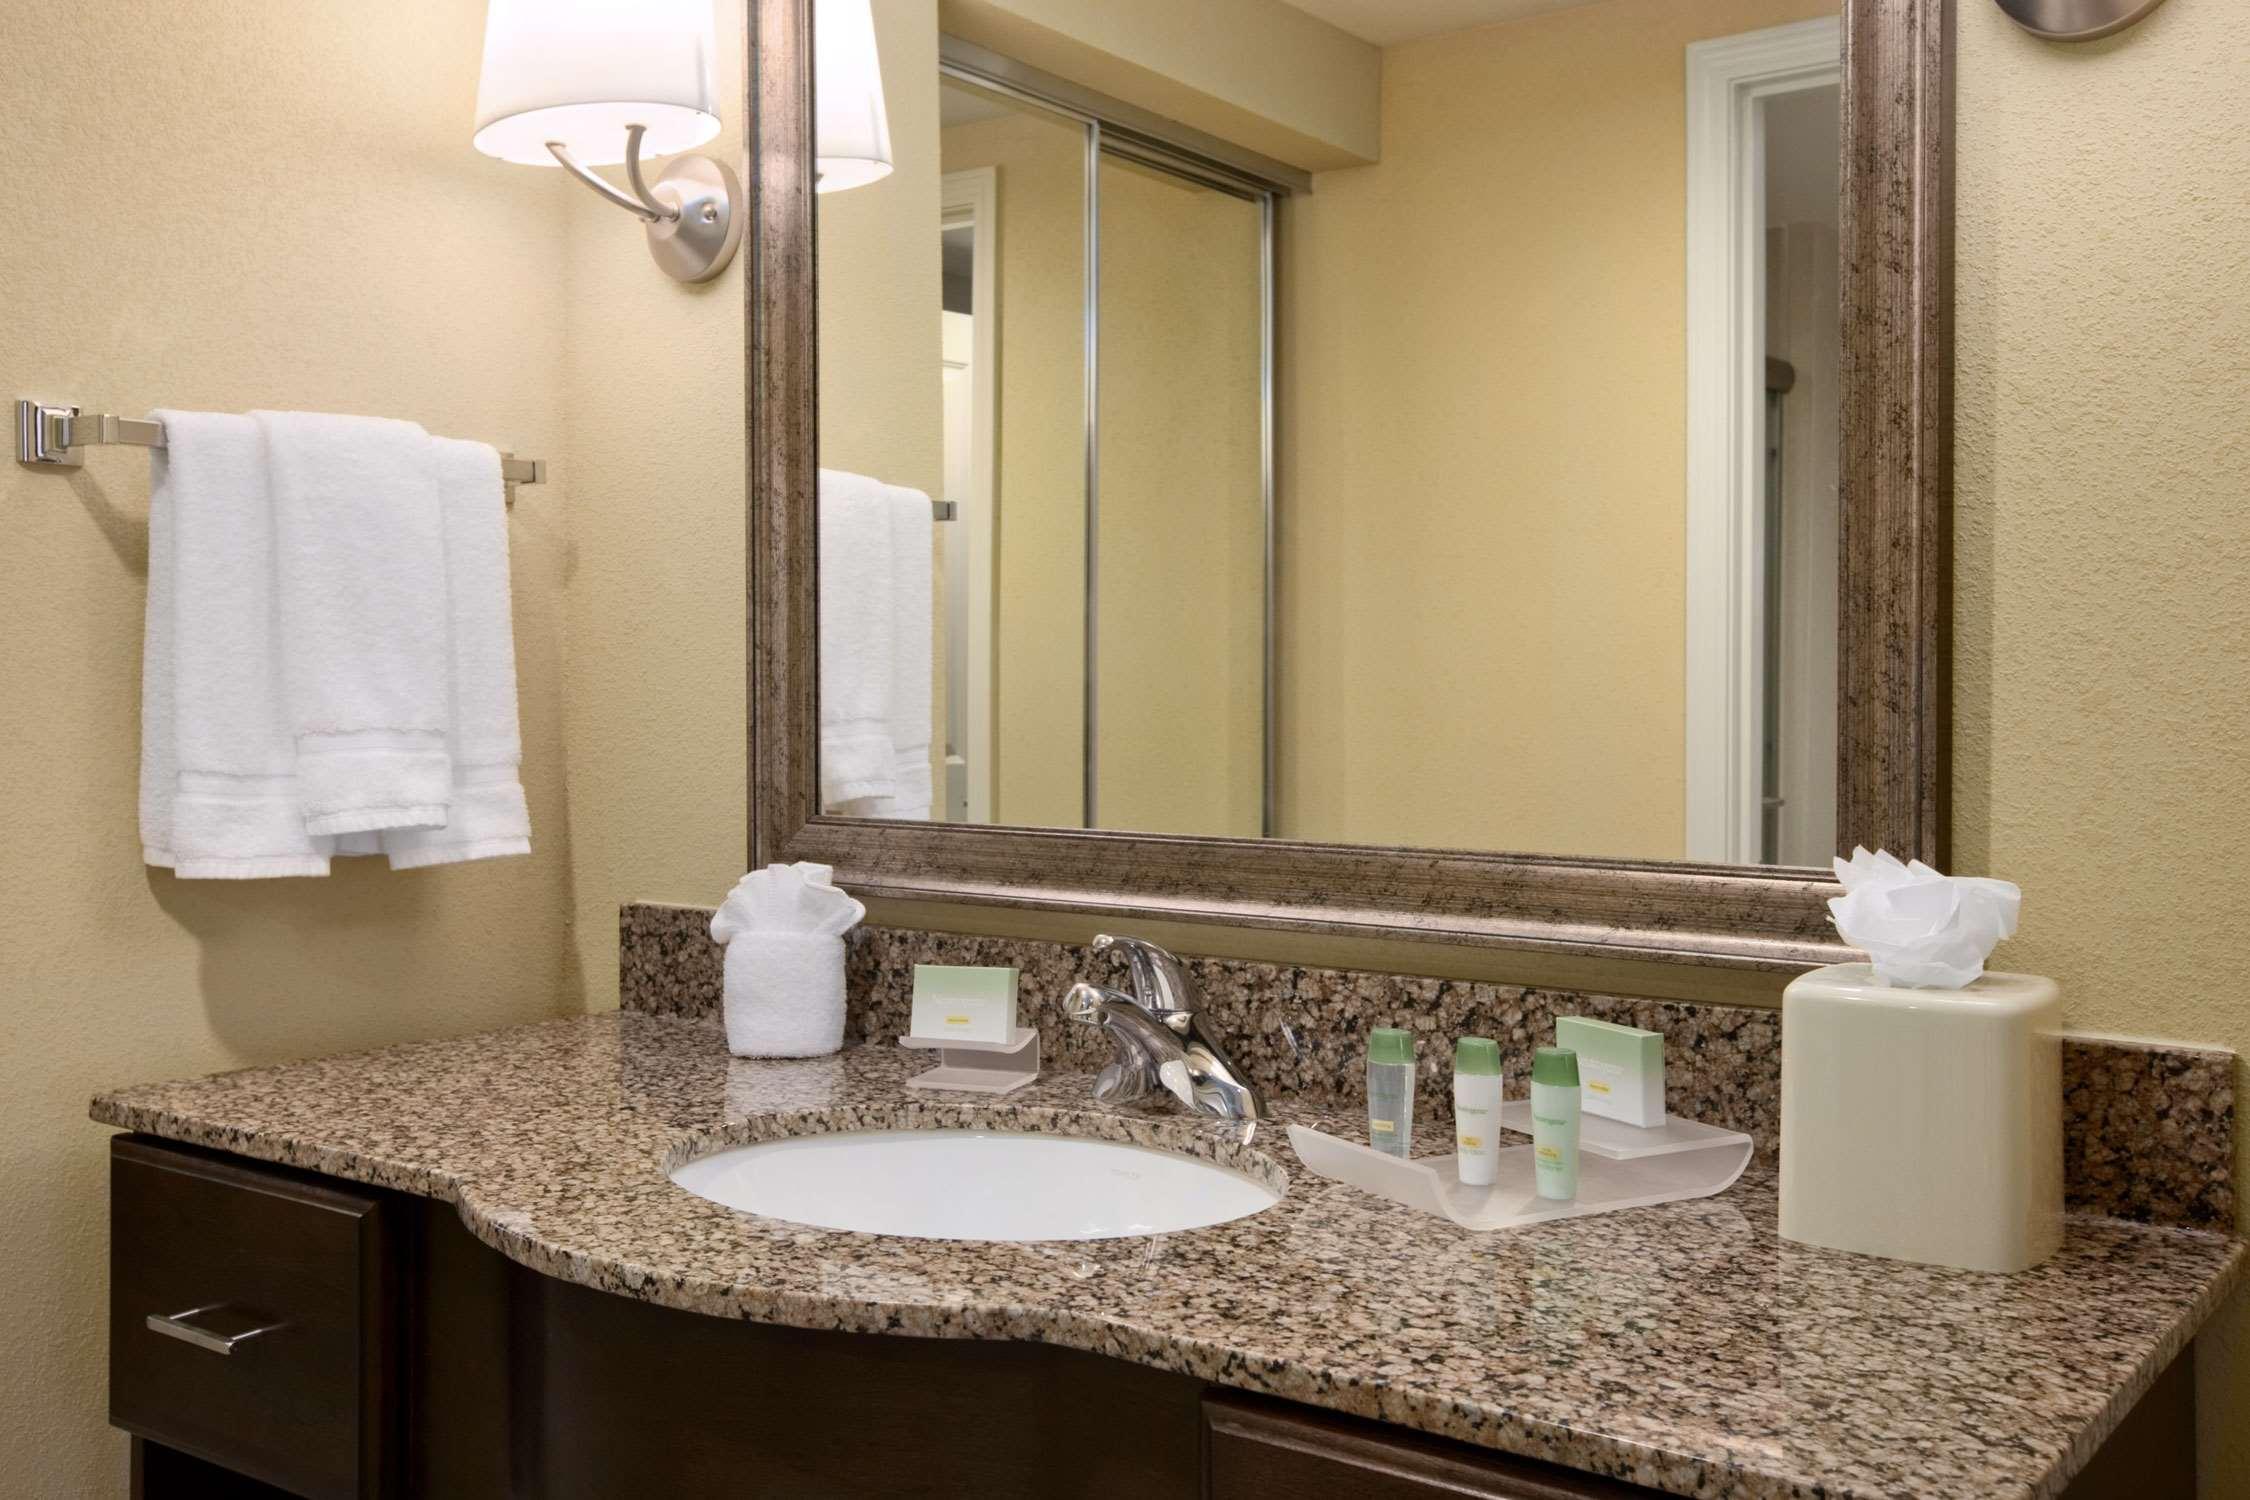 Homewood Suites by Hilton Charlotte/Ayrsley, NC image 12